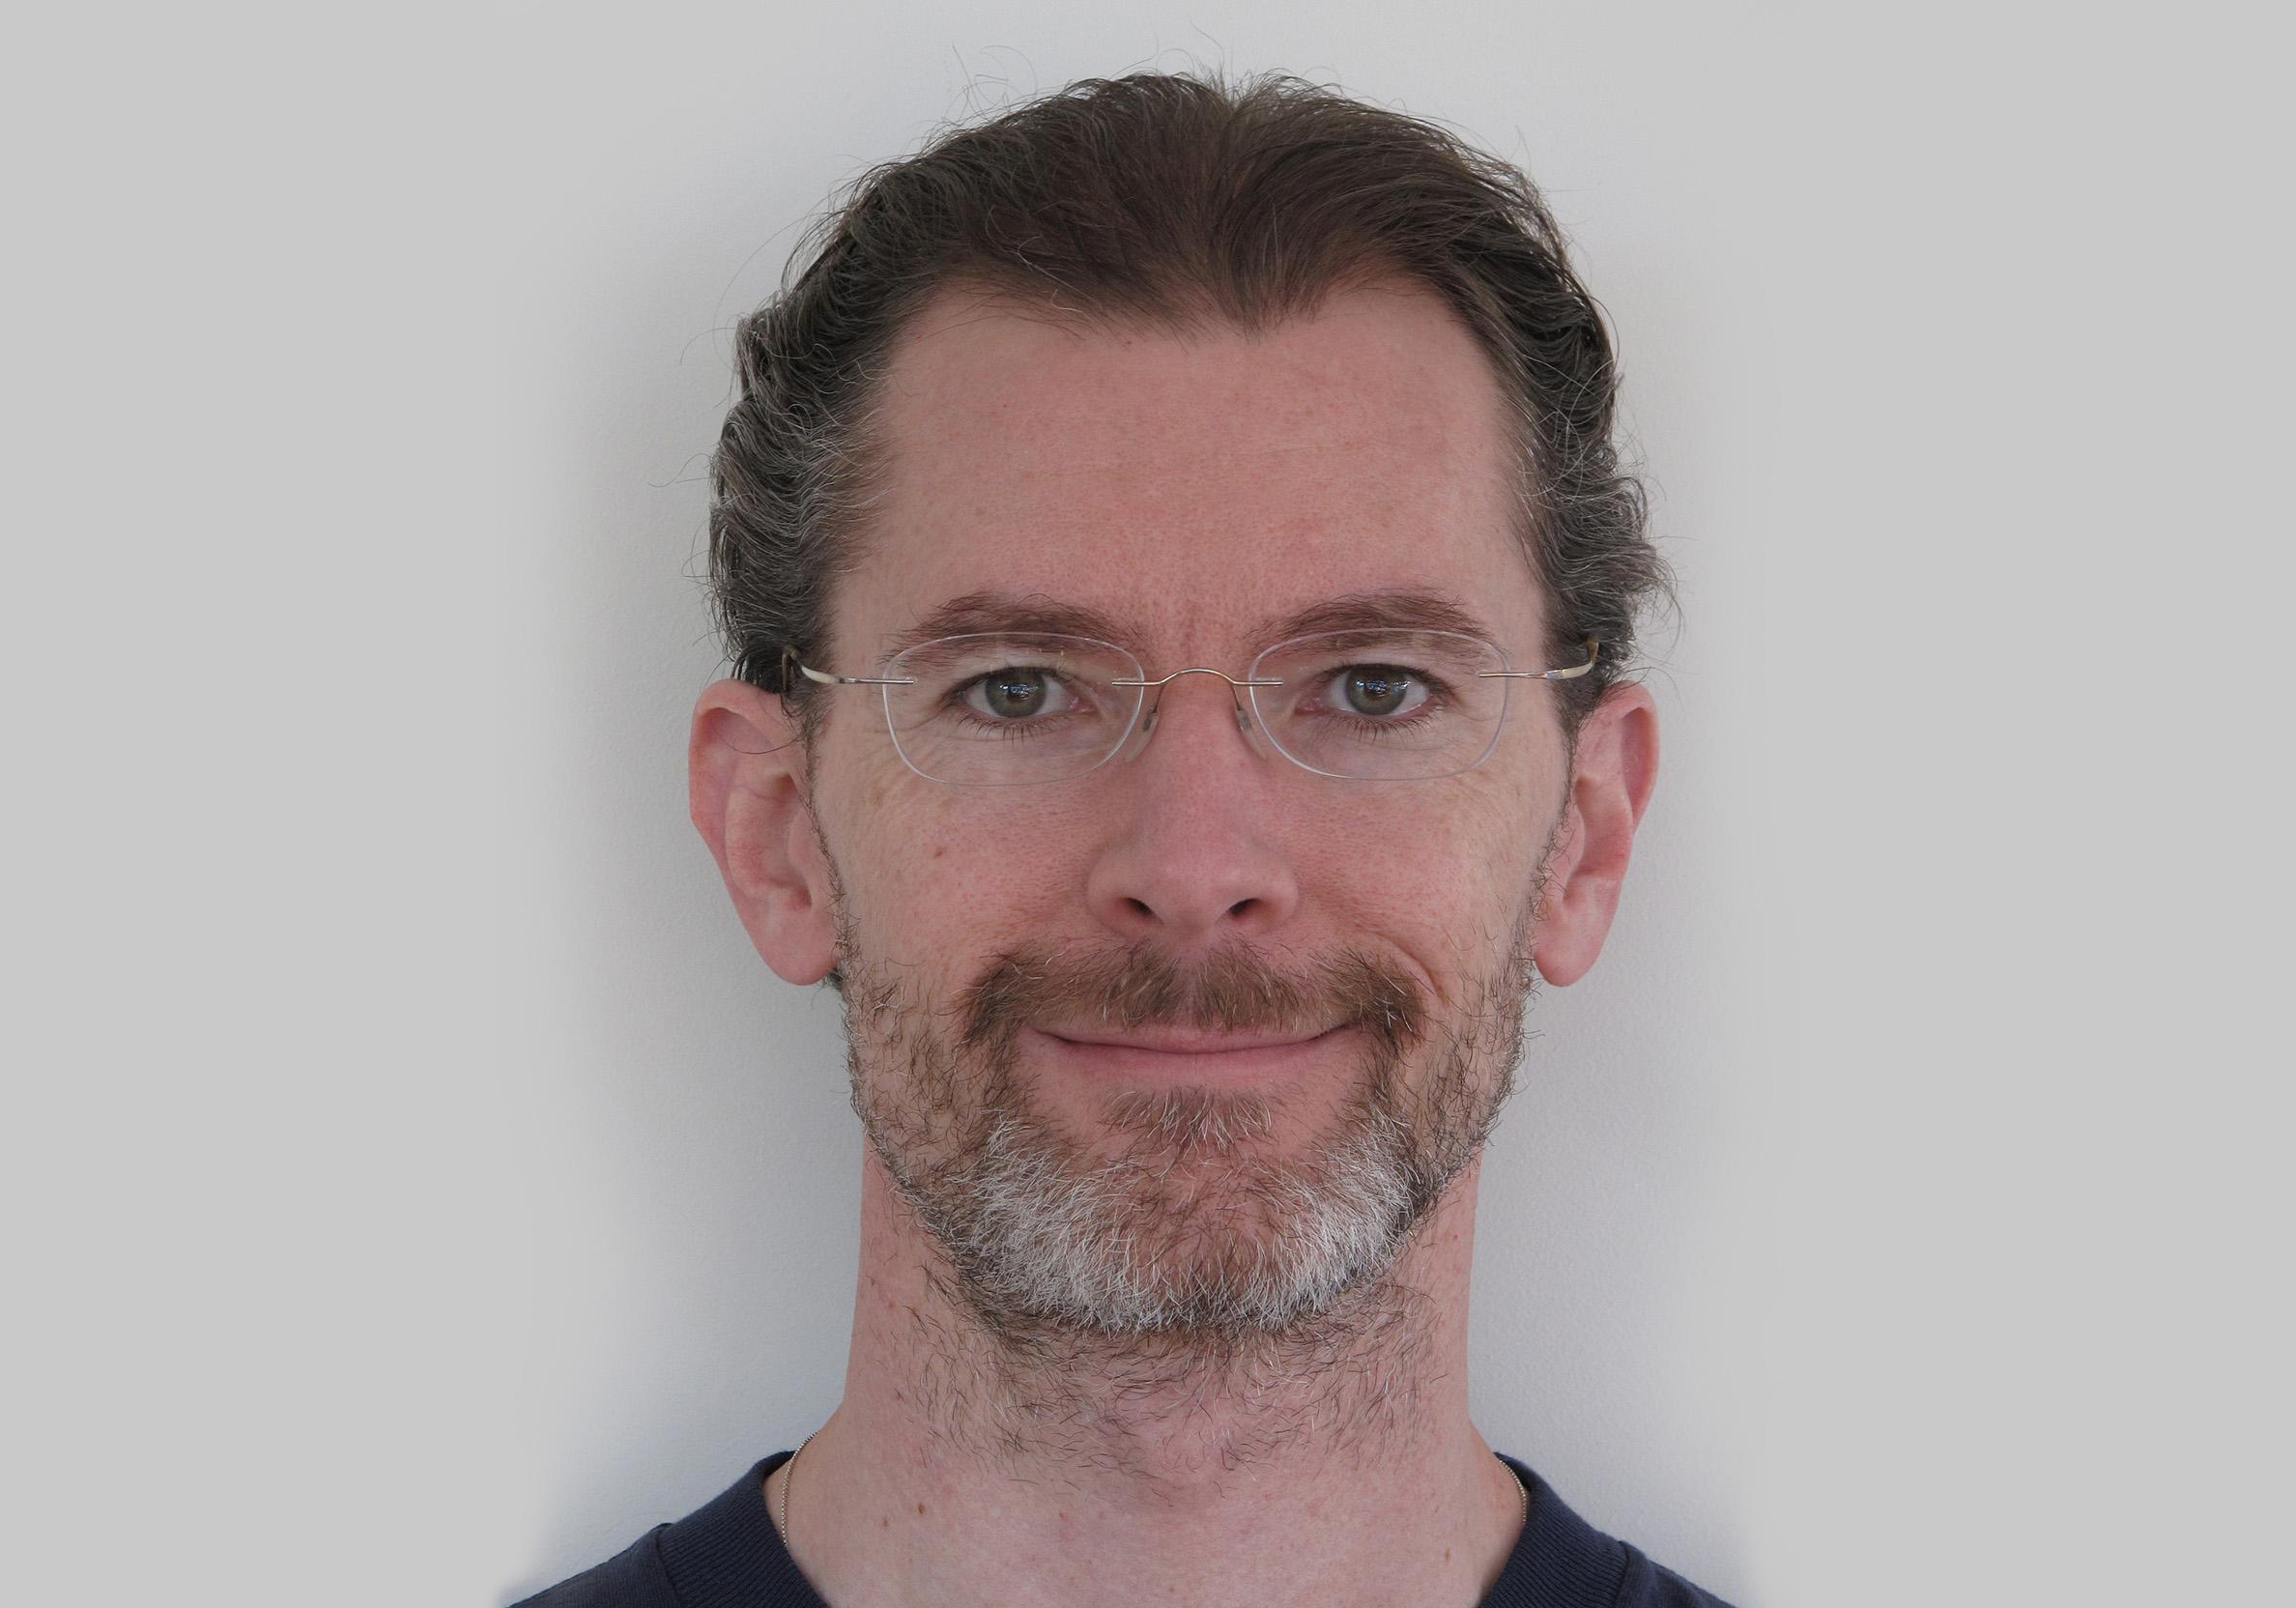 Matt Flynn, Owner & Architect of Flynn Architecture & Design, United States